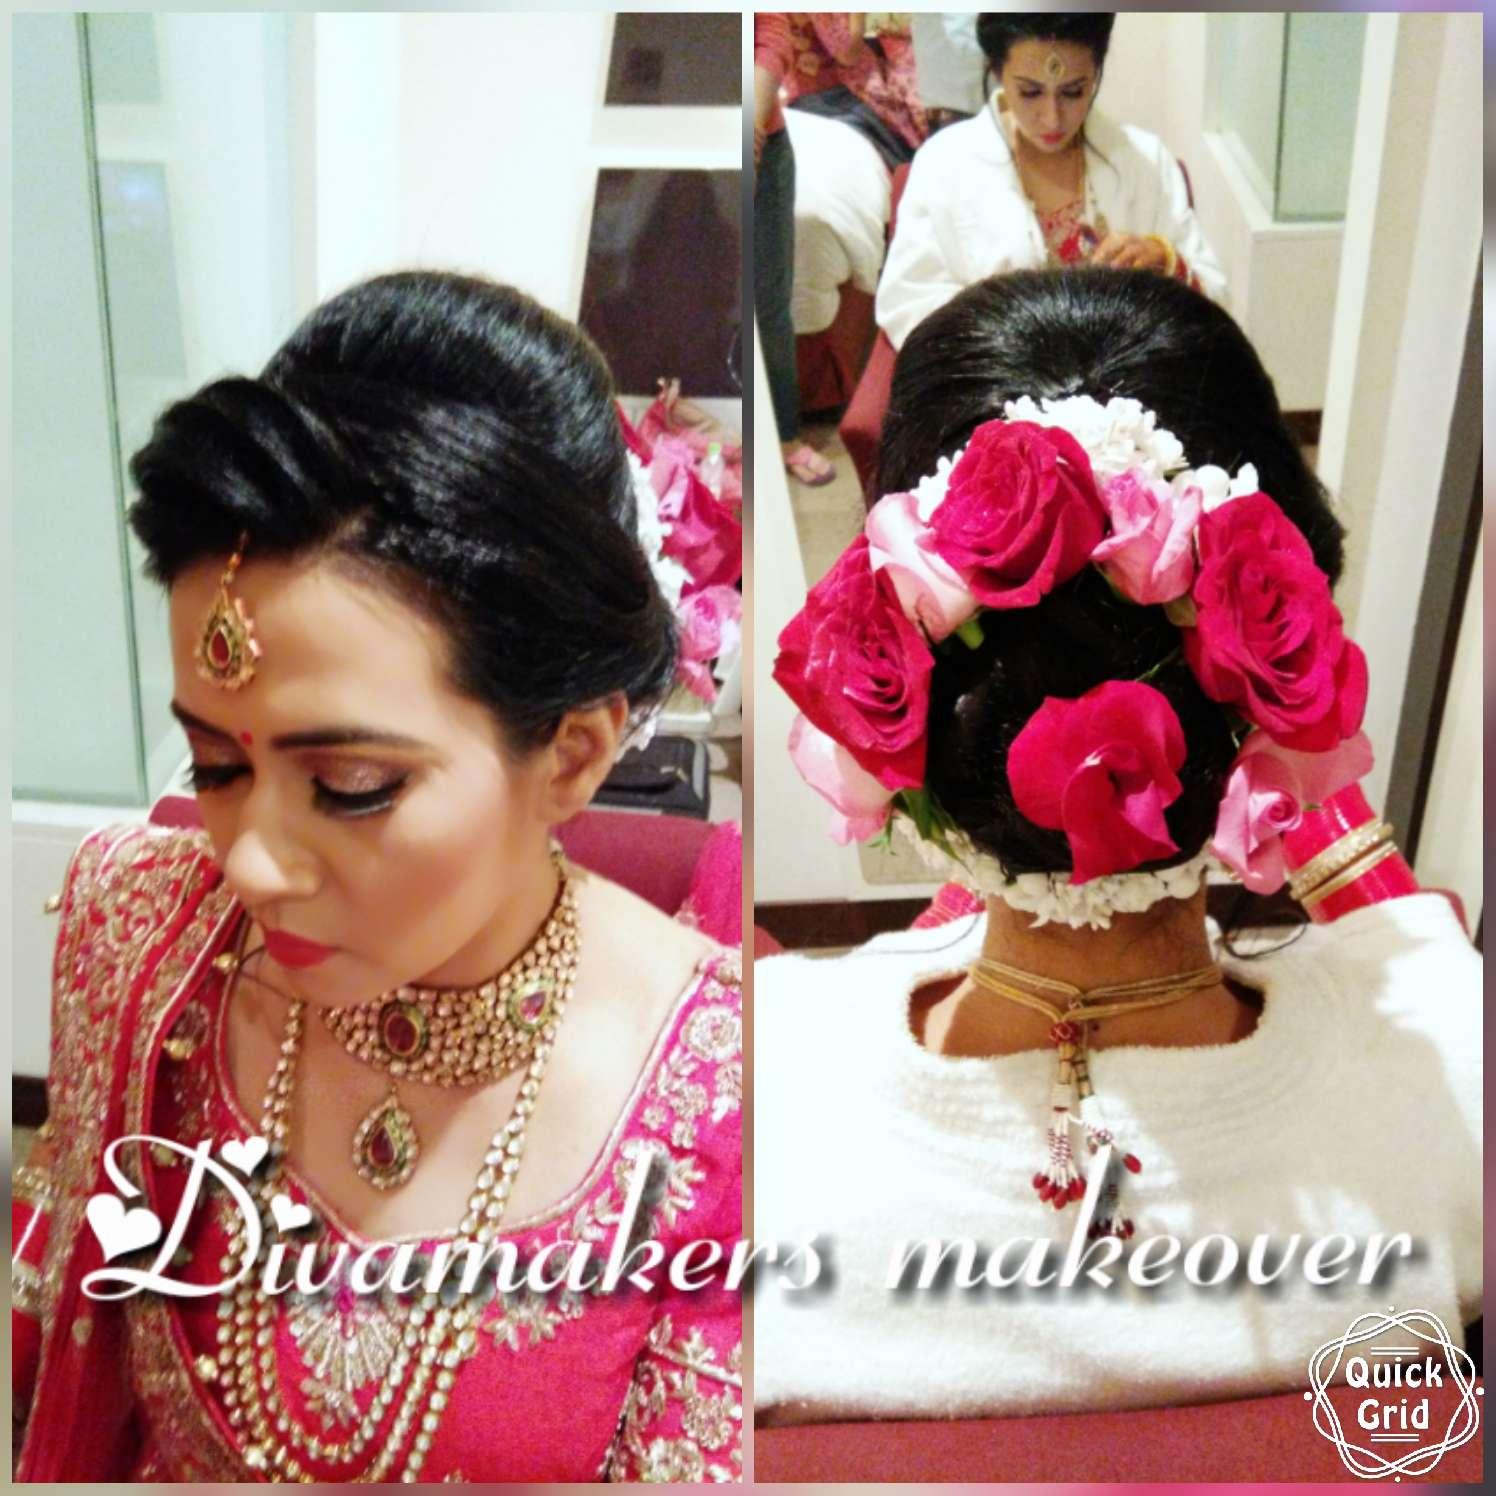 Portfolio - Divamaker makeup studio